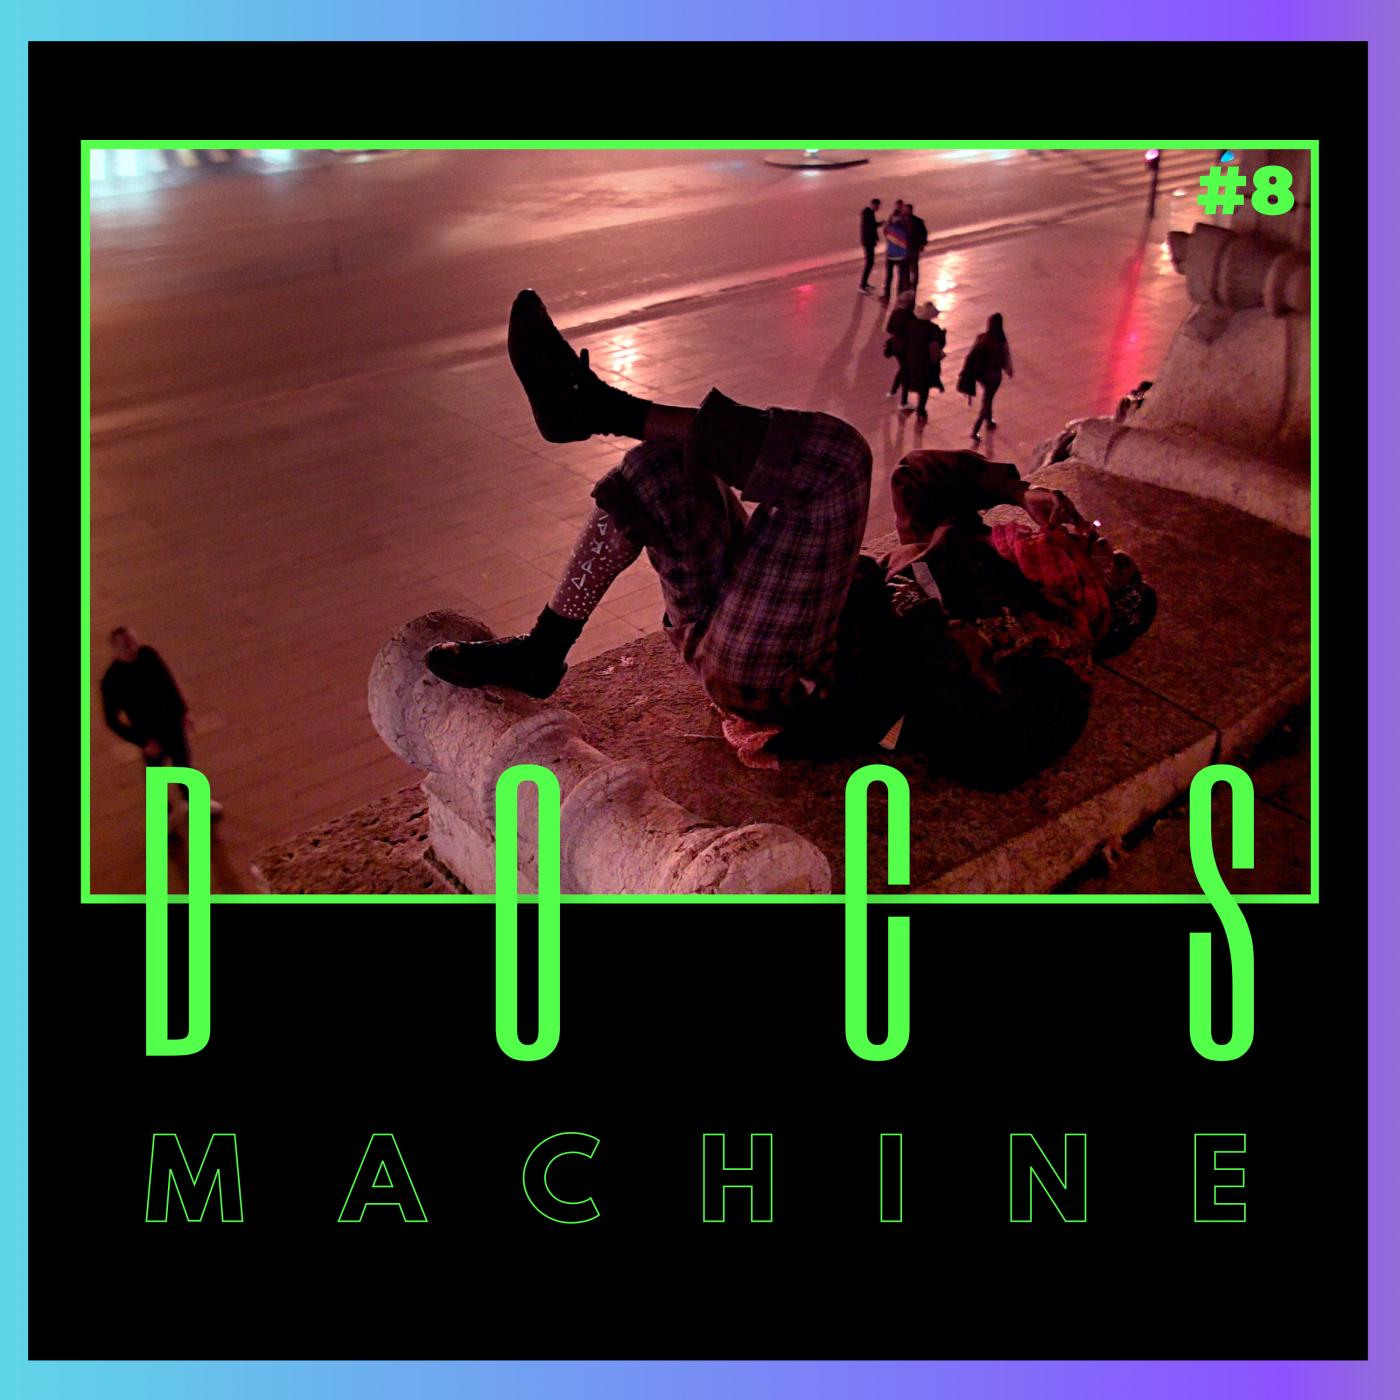 DOCS MACHINE #8. L'Époque, de Matthieu Bareyre // Paris State Of Mind // D'Arc Dark // Chemin Volcan